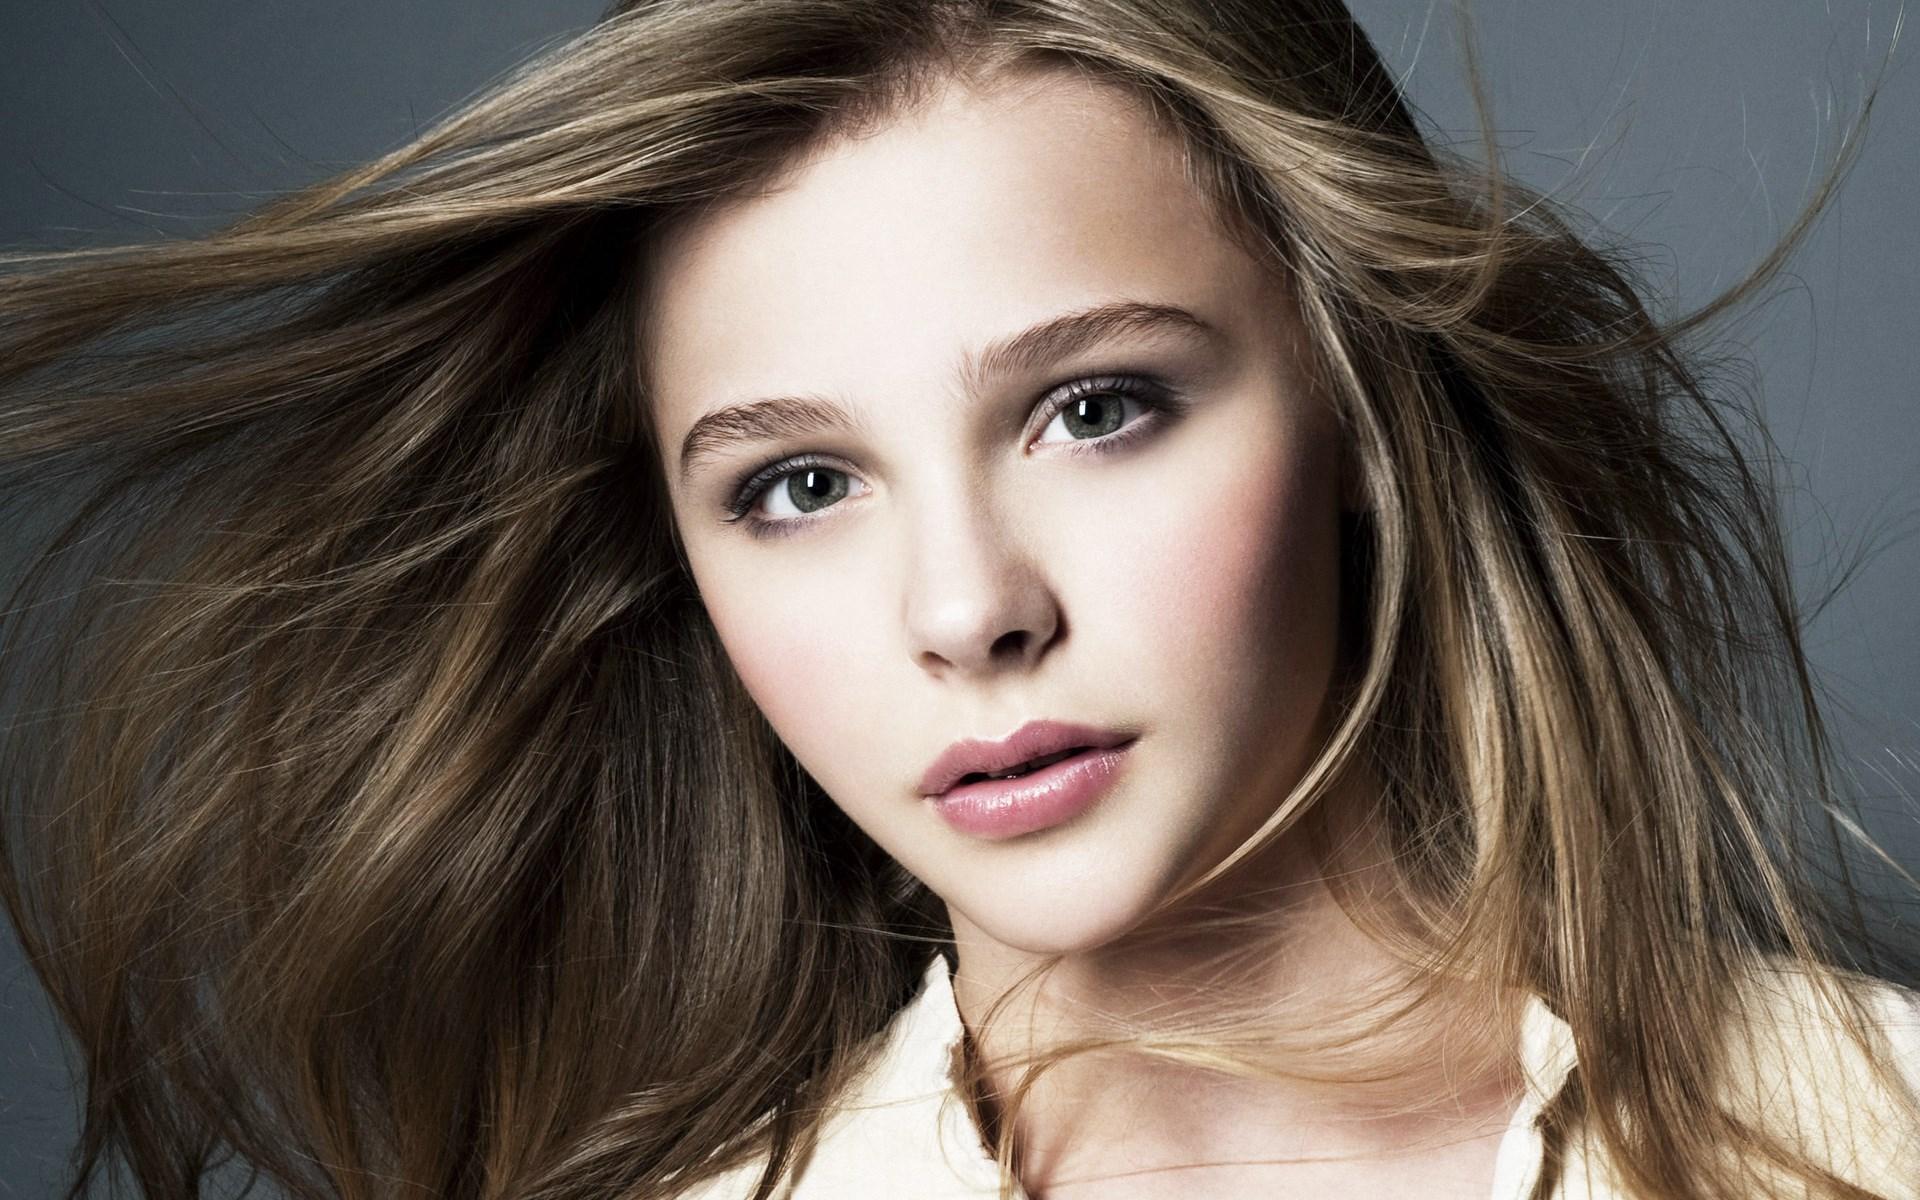 Actress Chloe Grace Moretz - age: 20